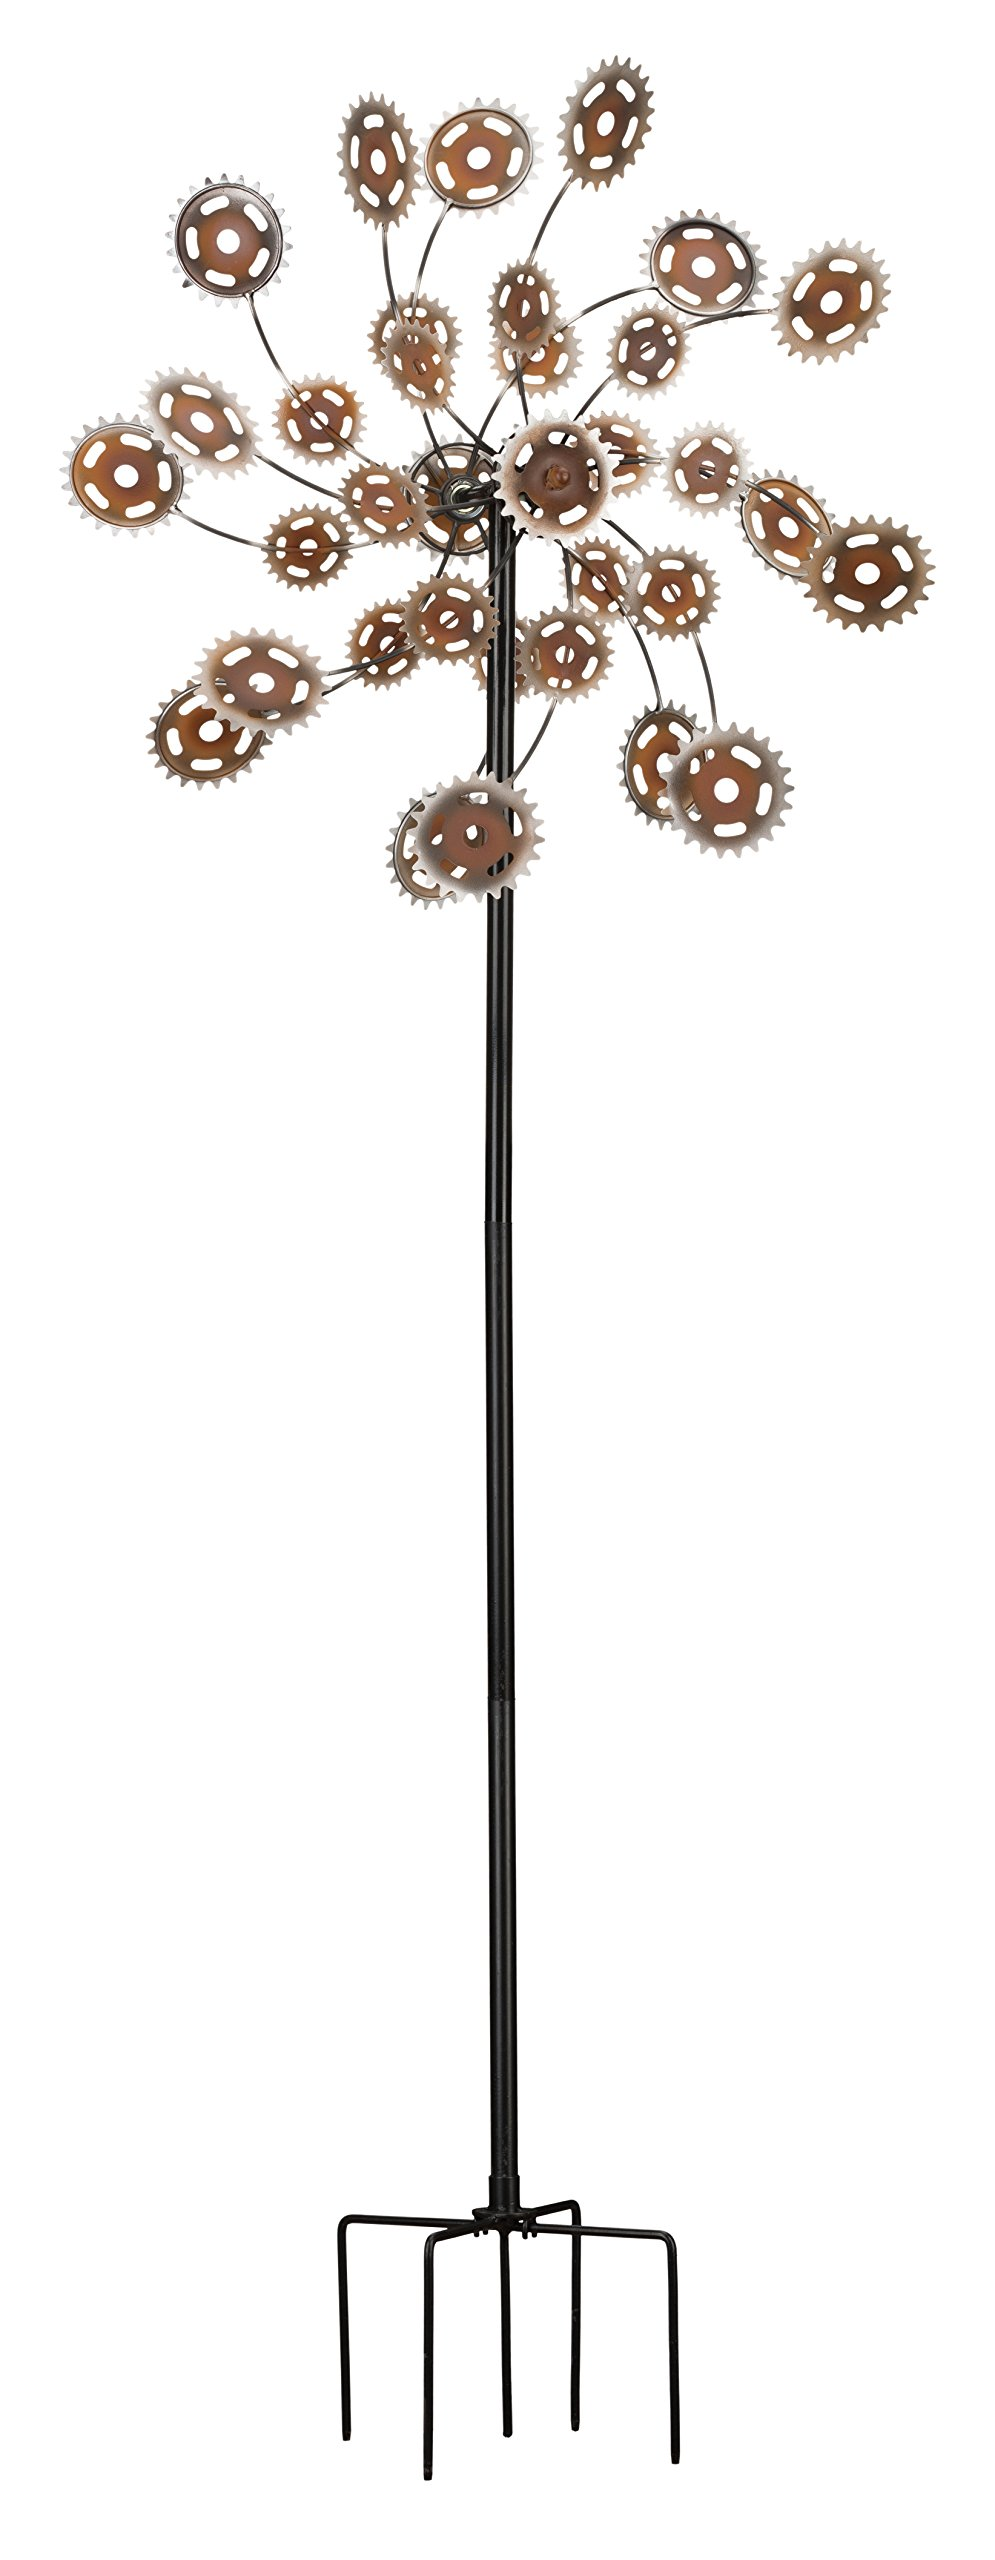 Regal Art & Gift Rotating Rustic Gears Kinetic Stake, 26'' by Regal Art & Gift